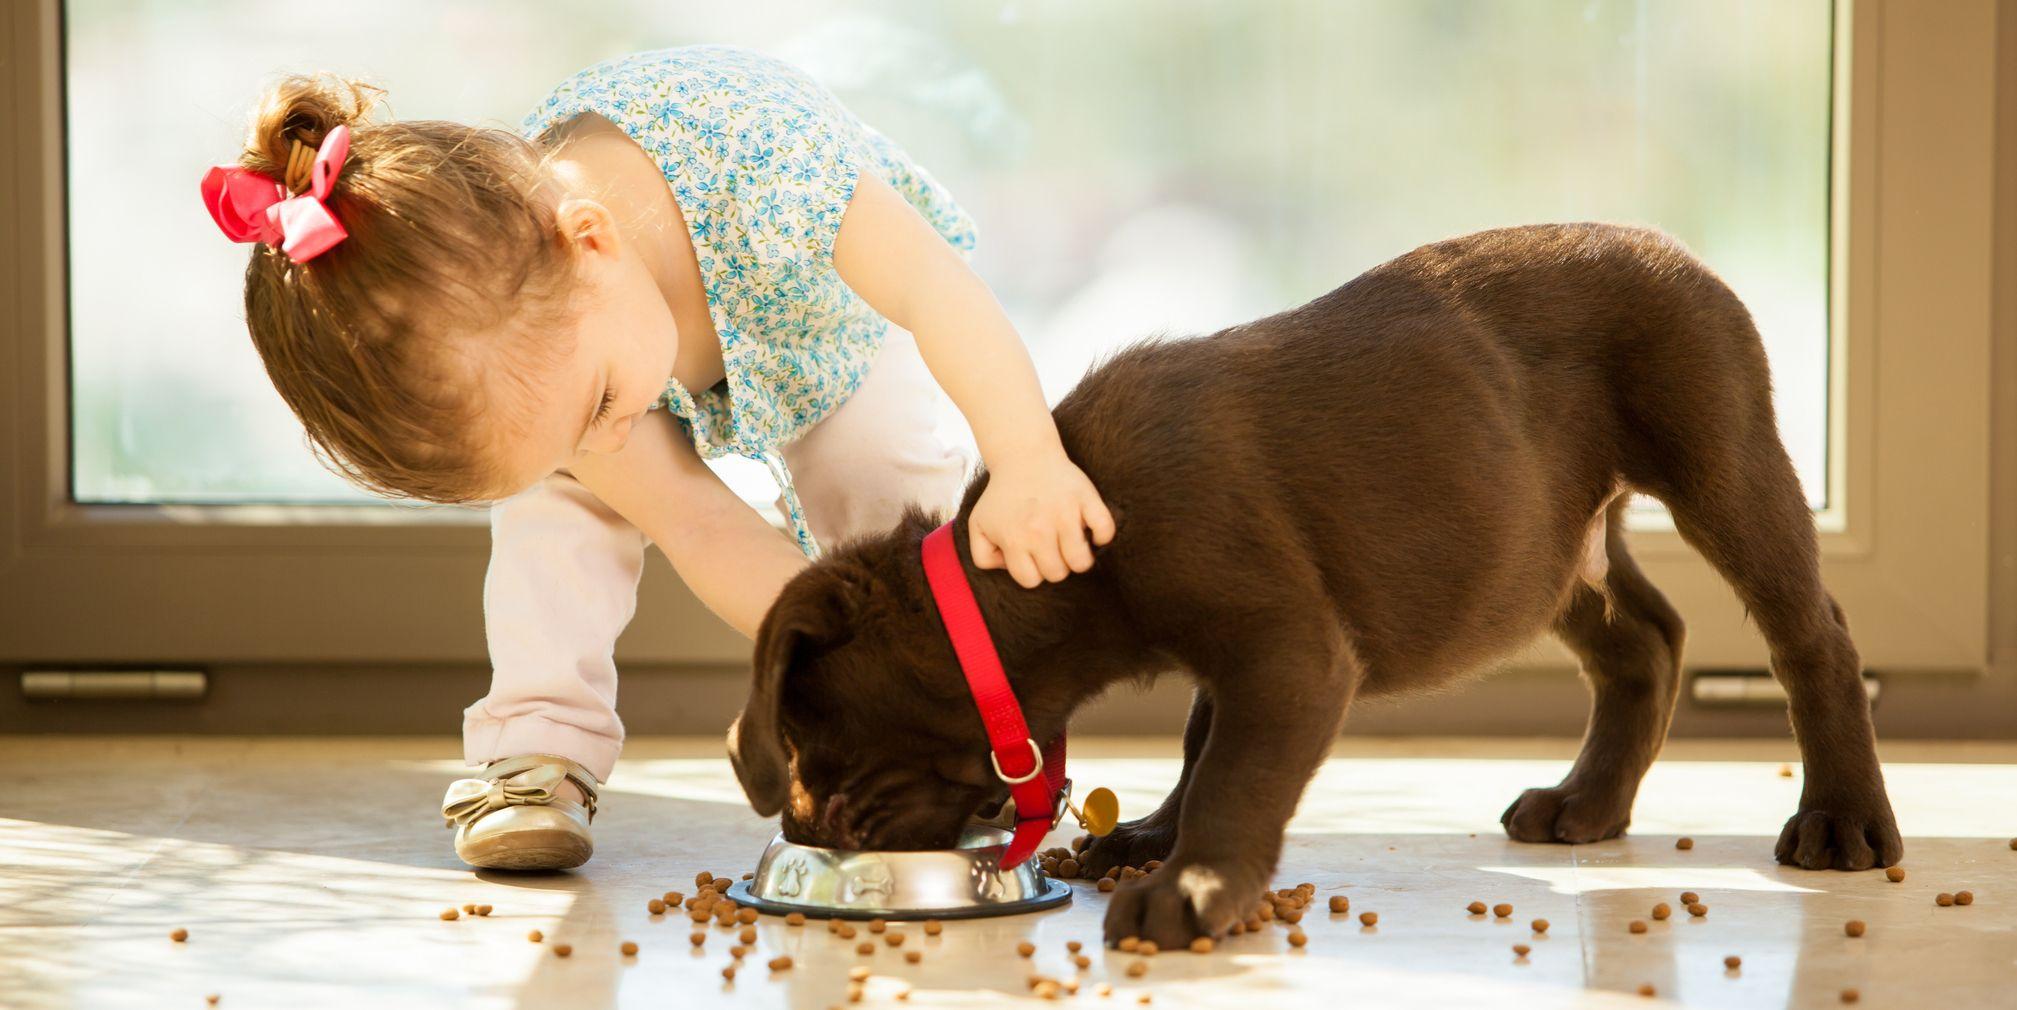 1521475593-girl-labrador-retriever-puppy